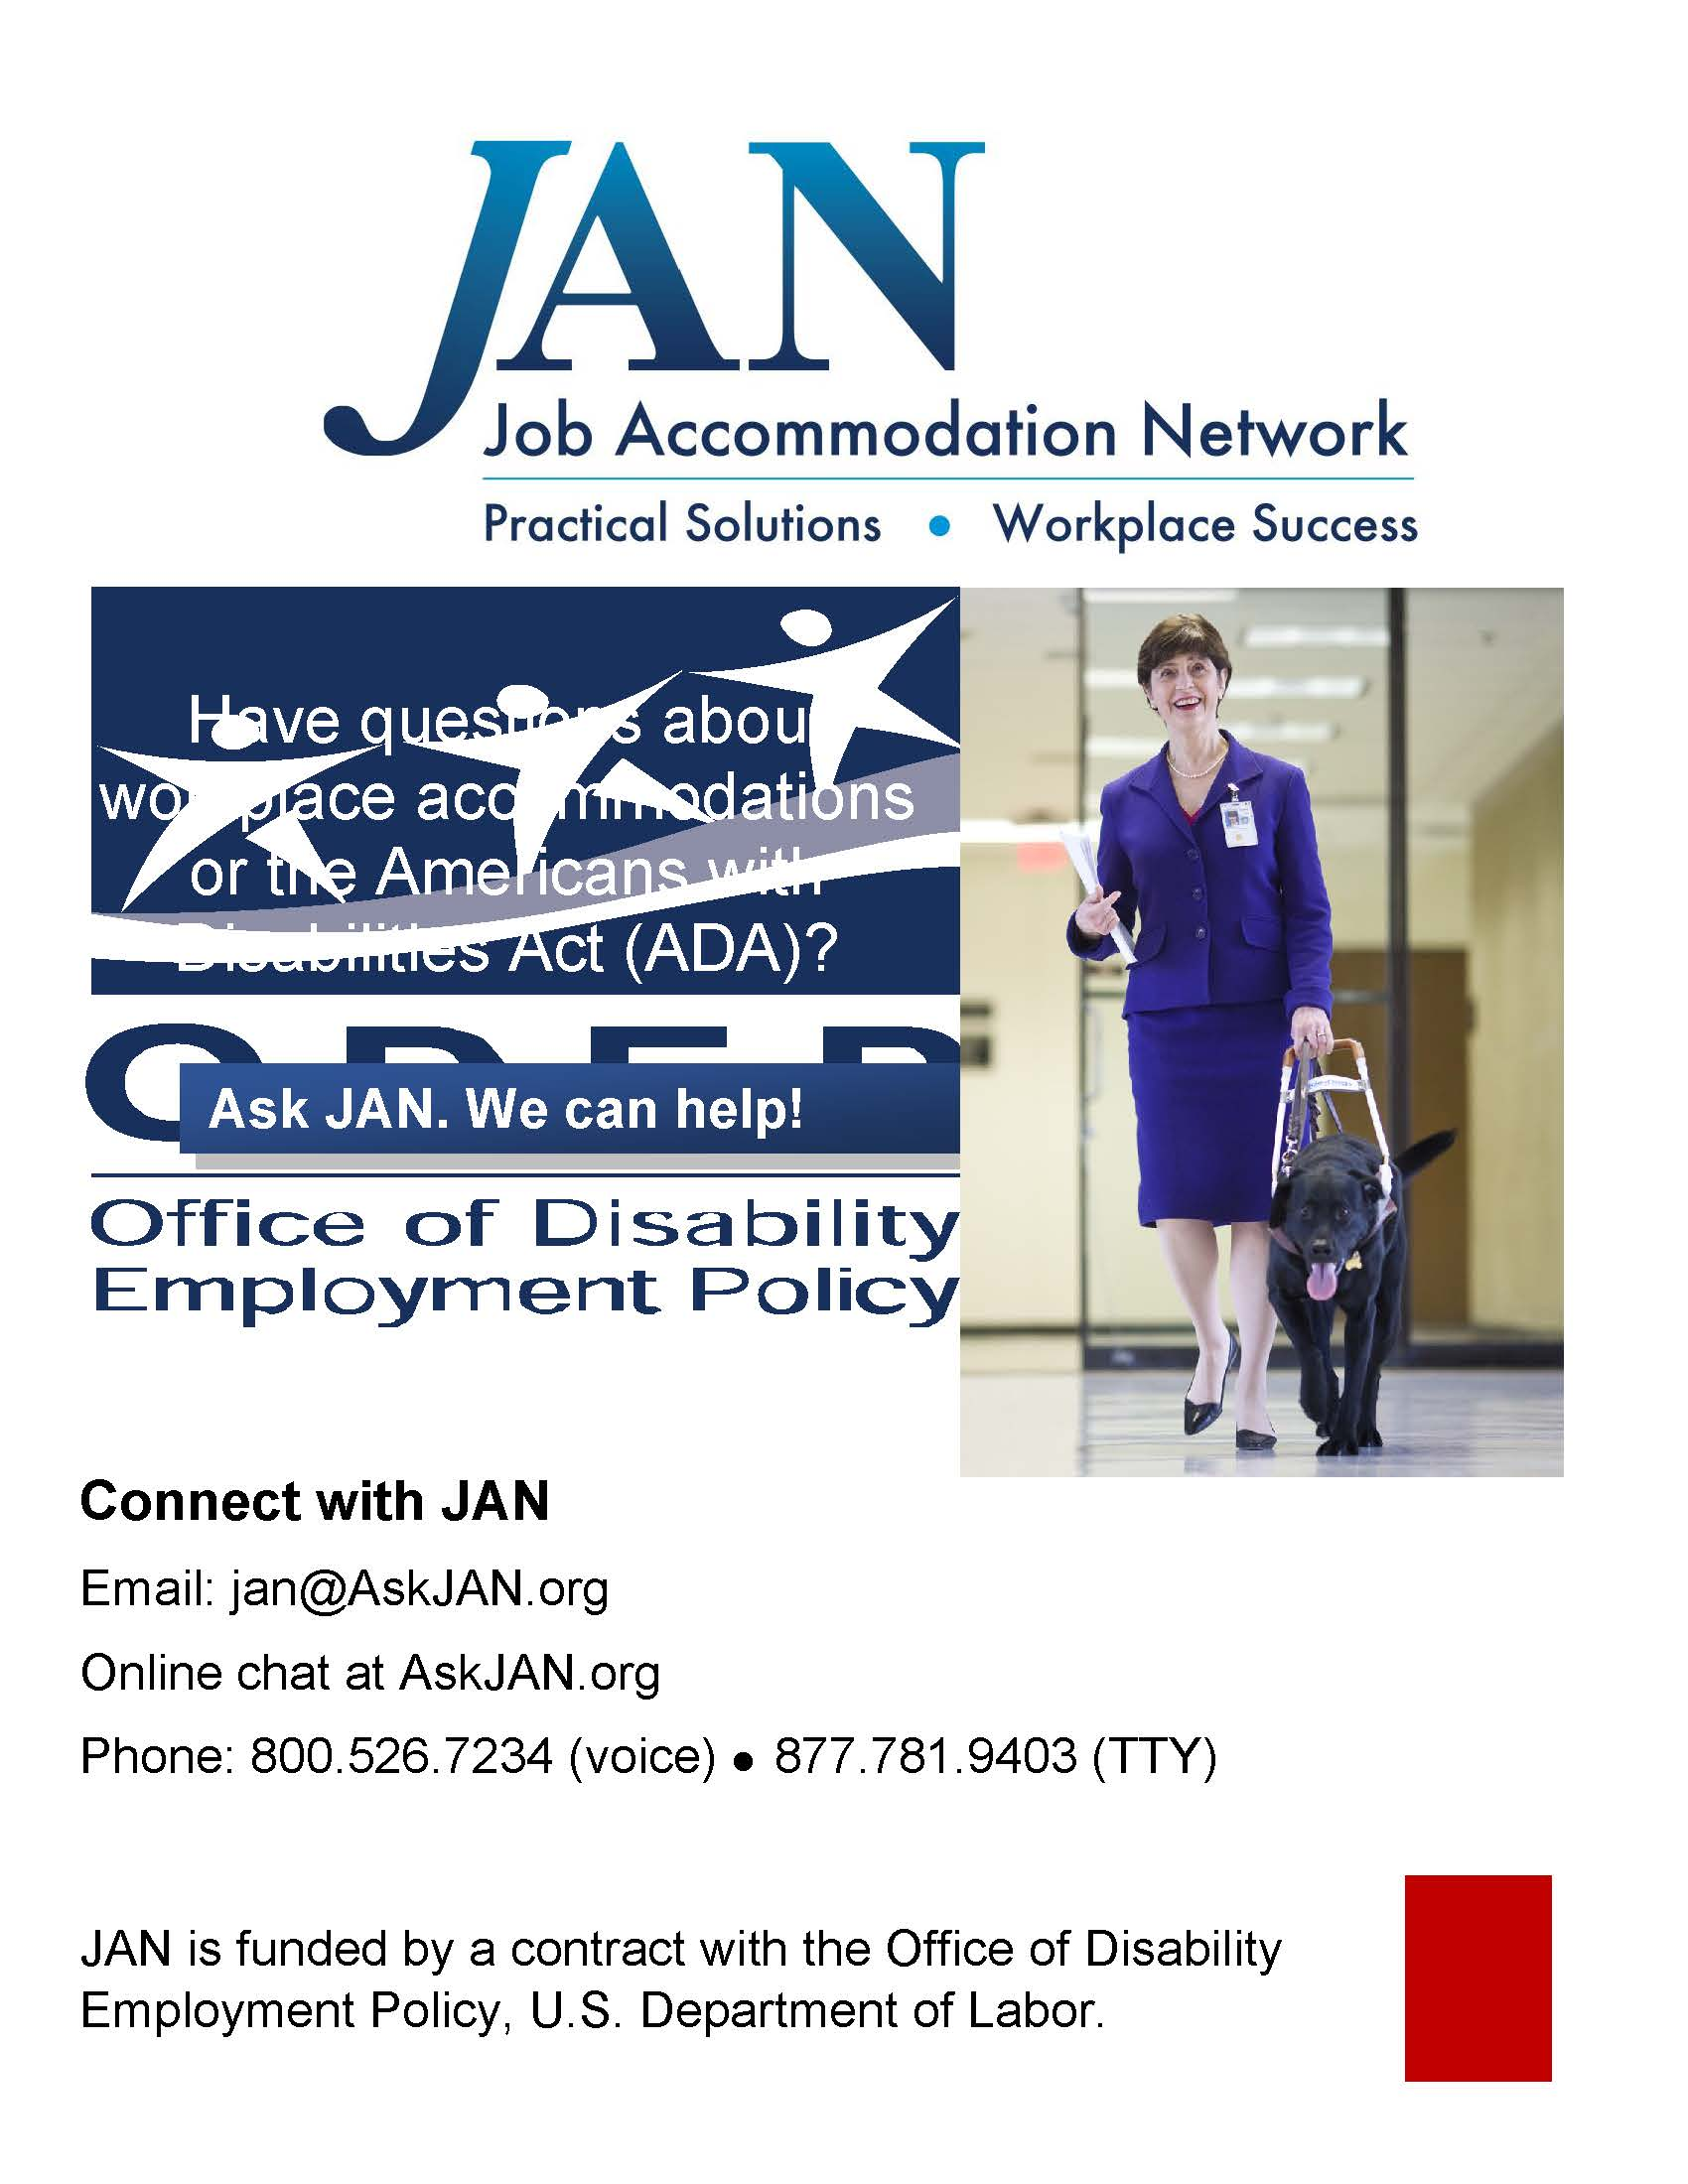 Job Accommodations Network (JAN)